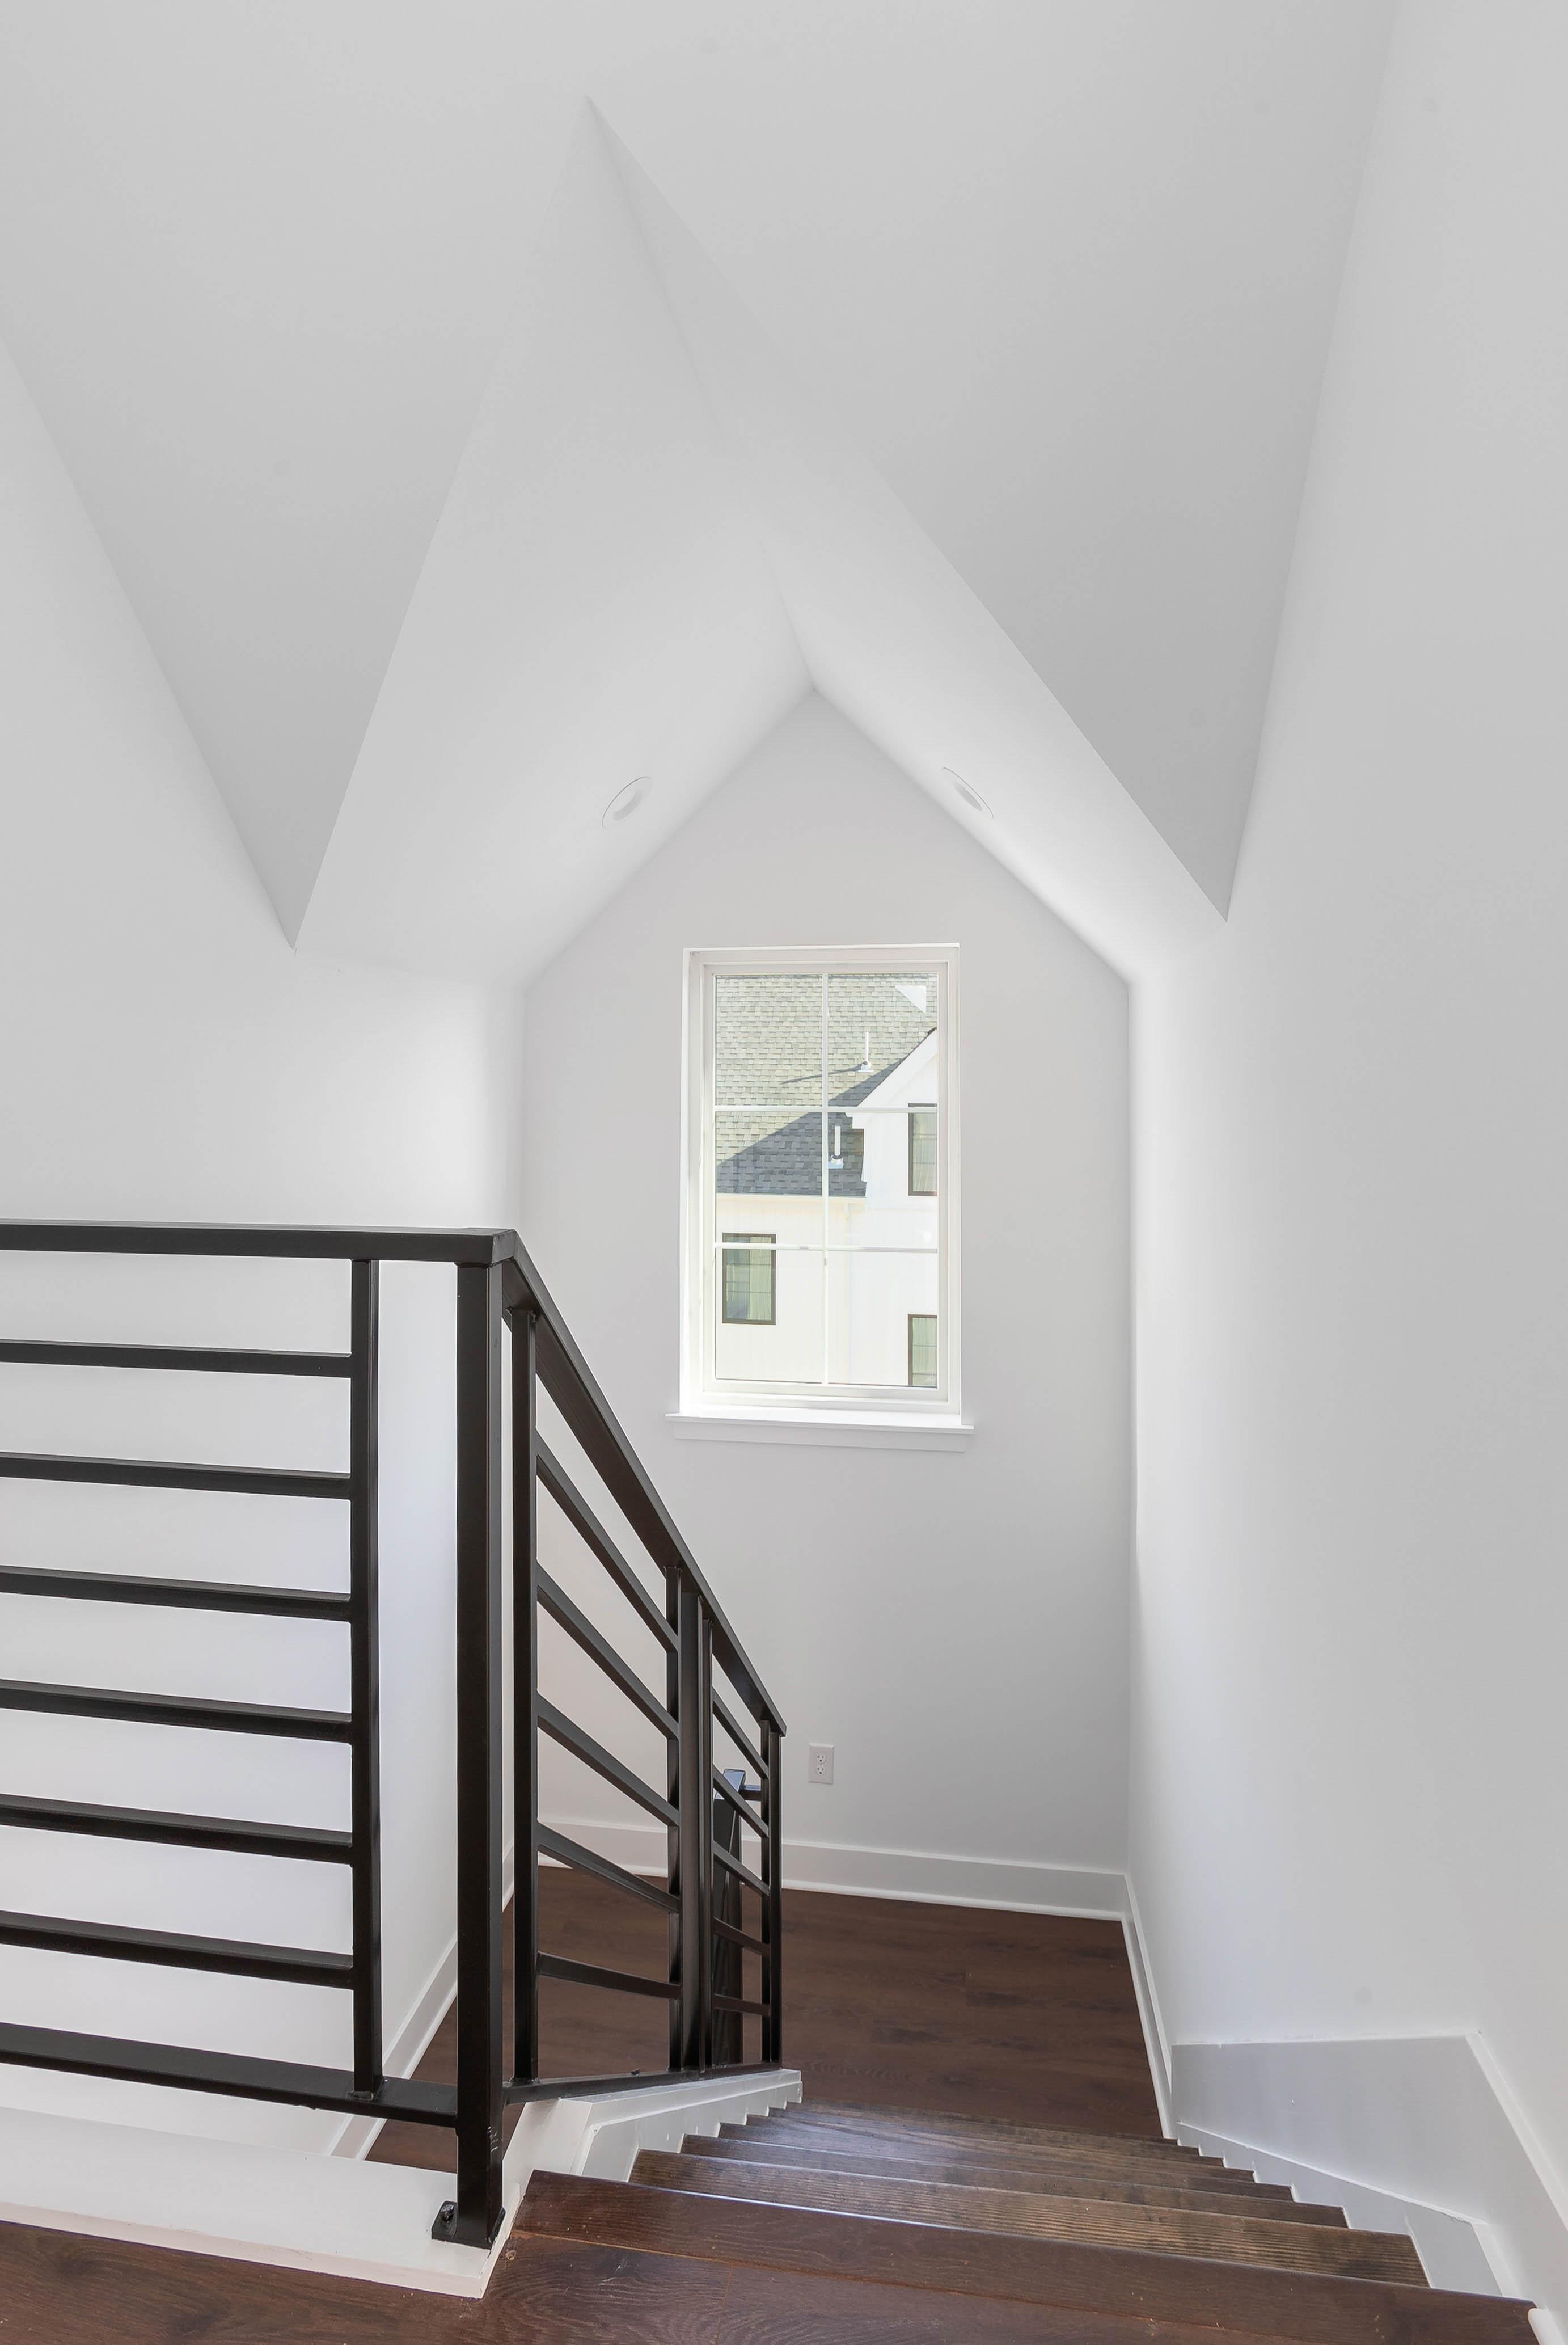 Ardleigh Street staircase